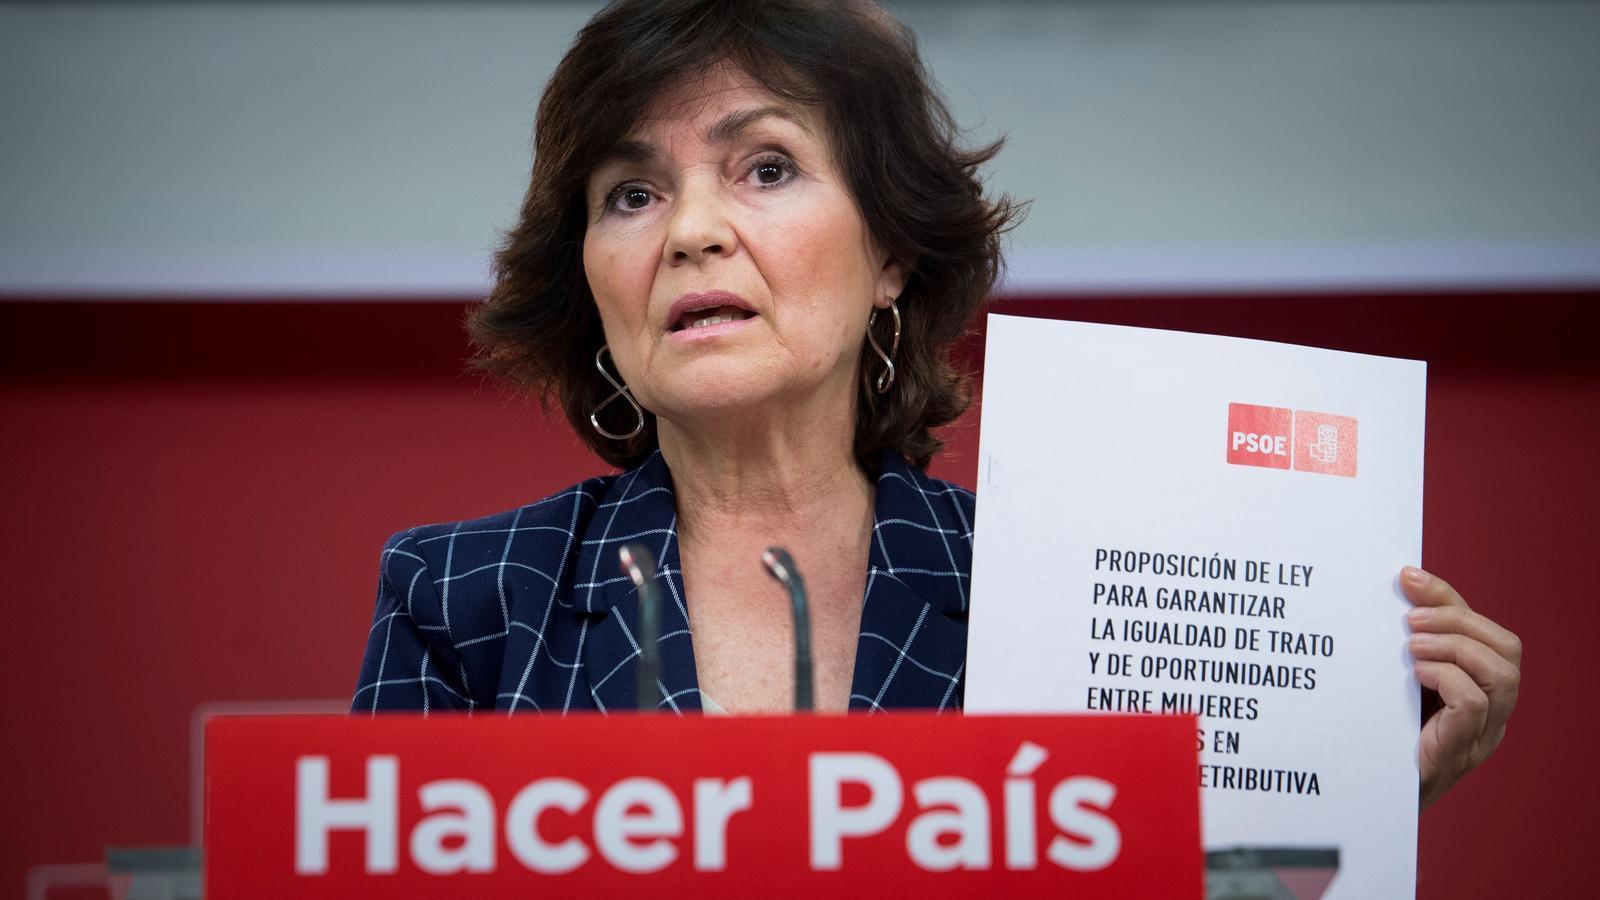 Carmen Calvo serà la vicepresidenta del govern espanyol i ministra d'Igualtat